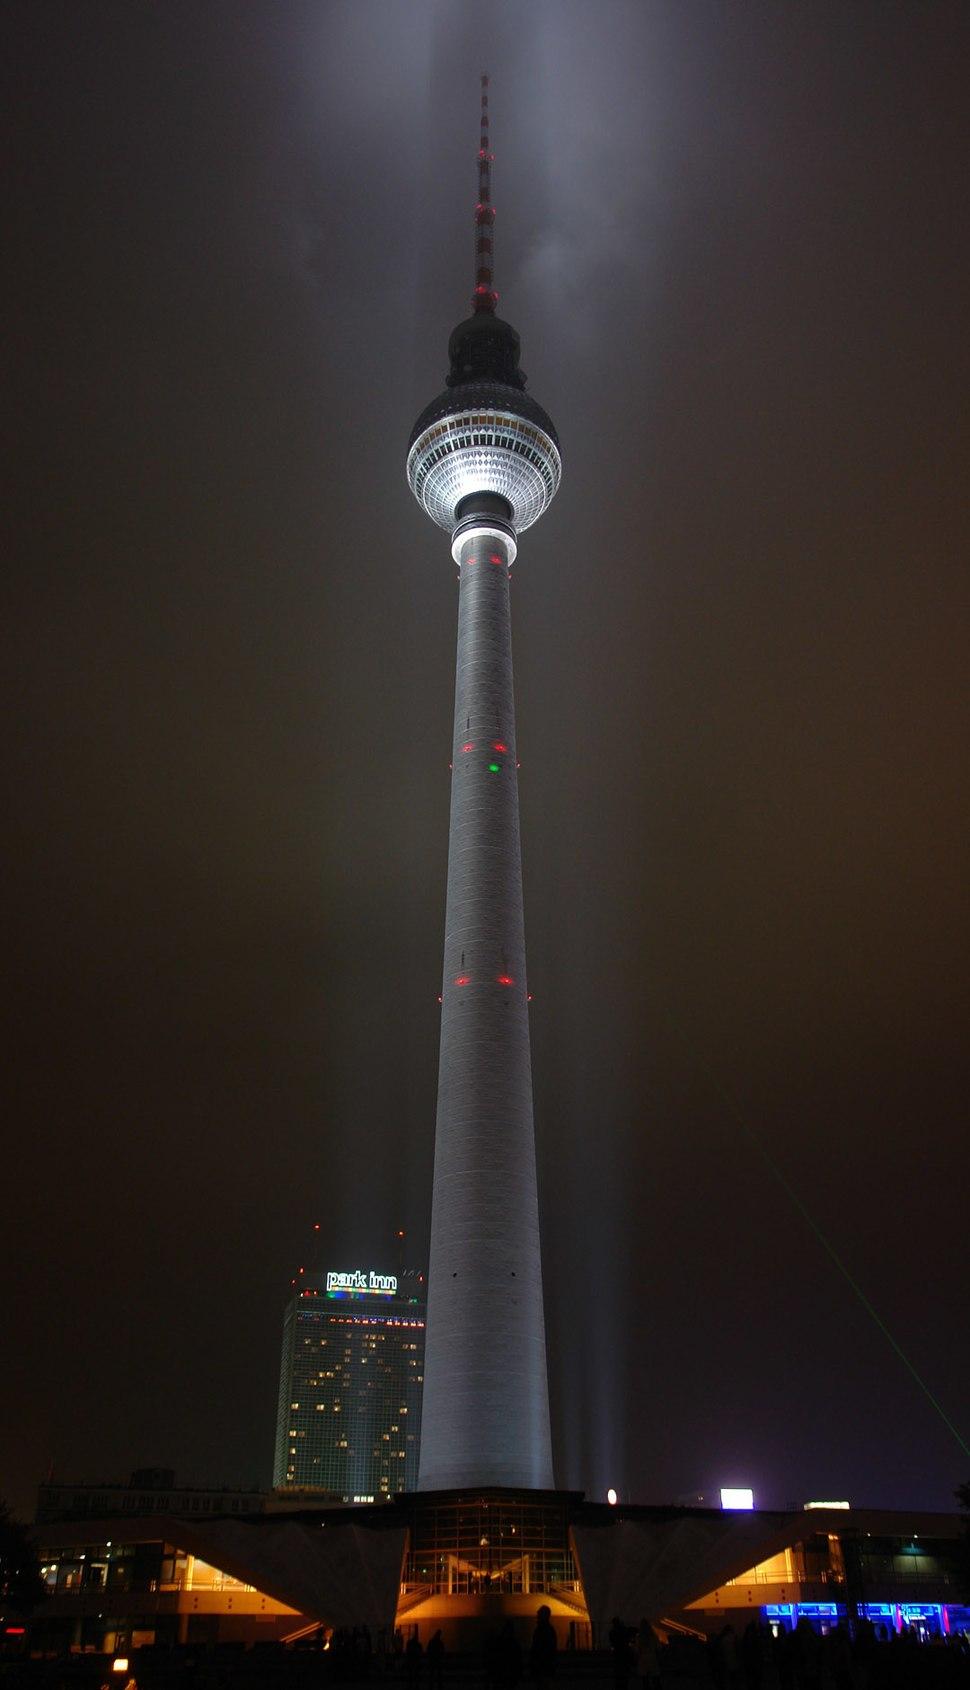 2009-10-23 - Festival of Lights - Fernsehturm 2